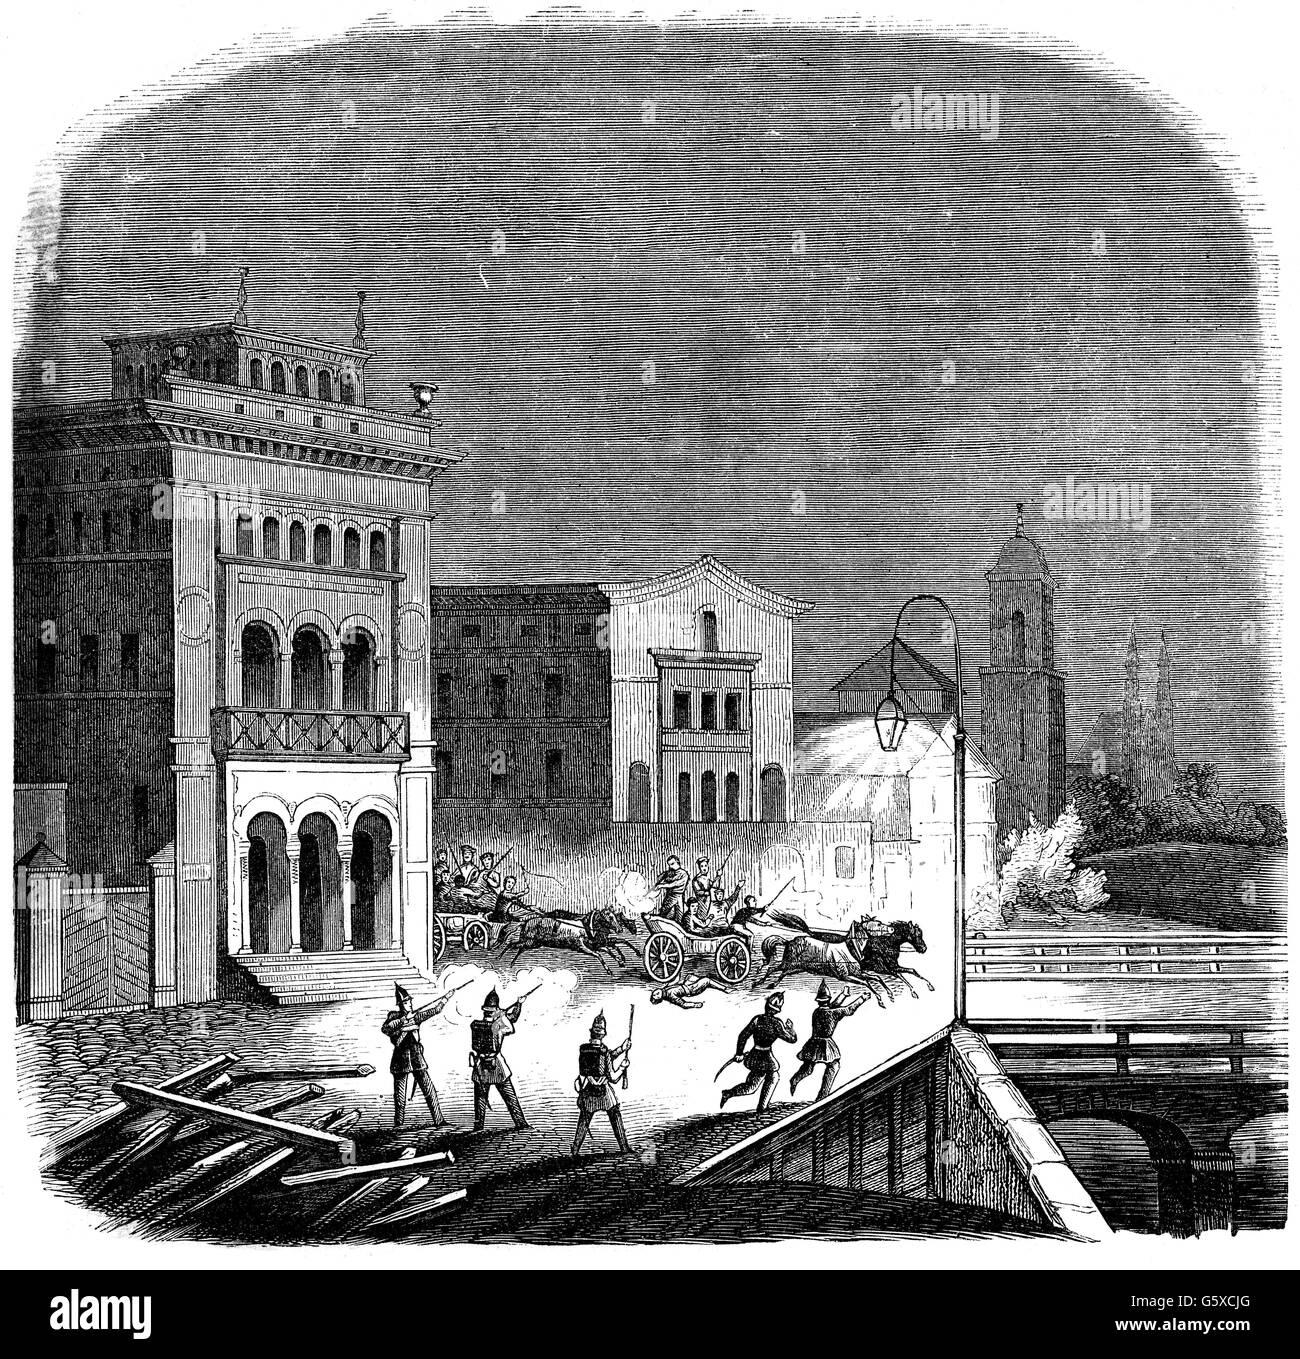 Greater Poland uprising 1846, attack on Wallscheid Bridge, Poznan, February 1846, Poland, Kingdom of Prussia, province - Stock Image